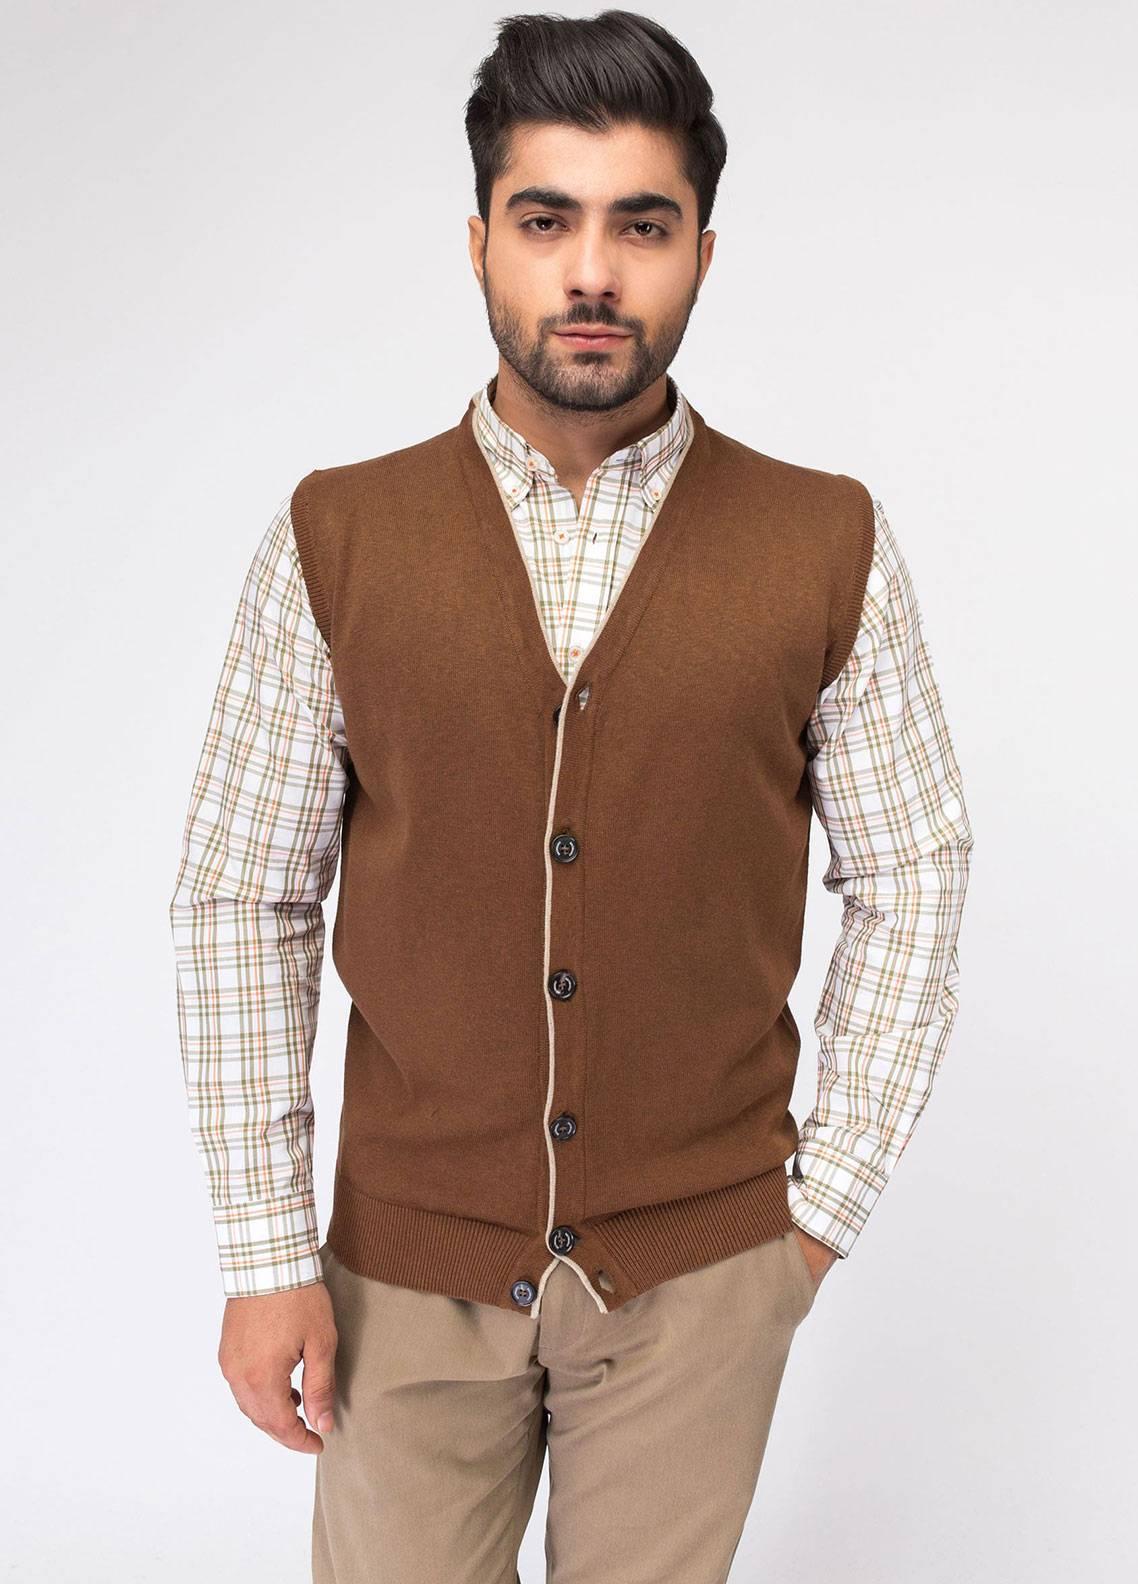 Brumano Cotton Button Cardigans for Men - Brown BRM-23-867